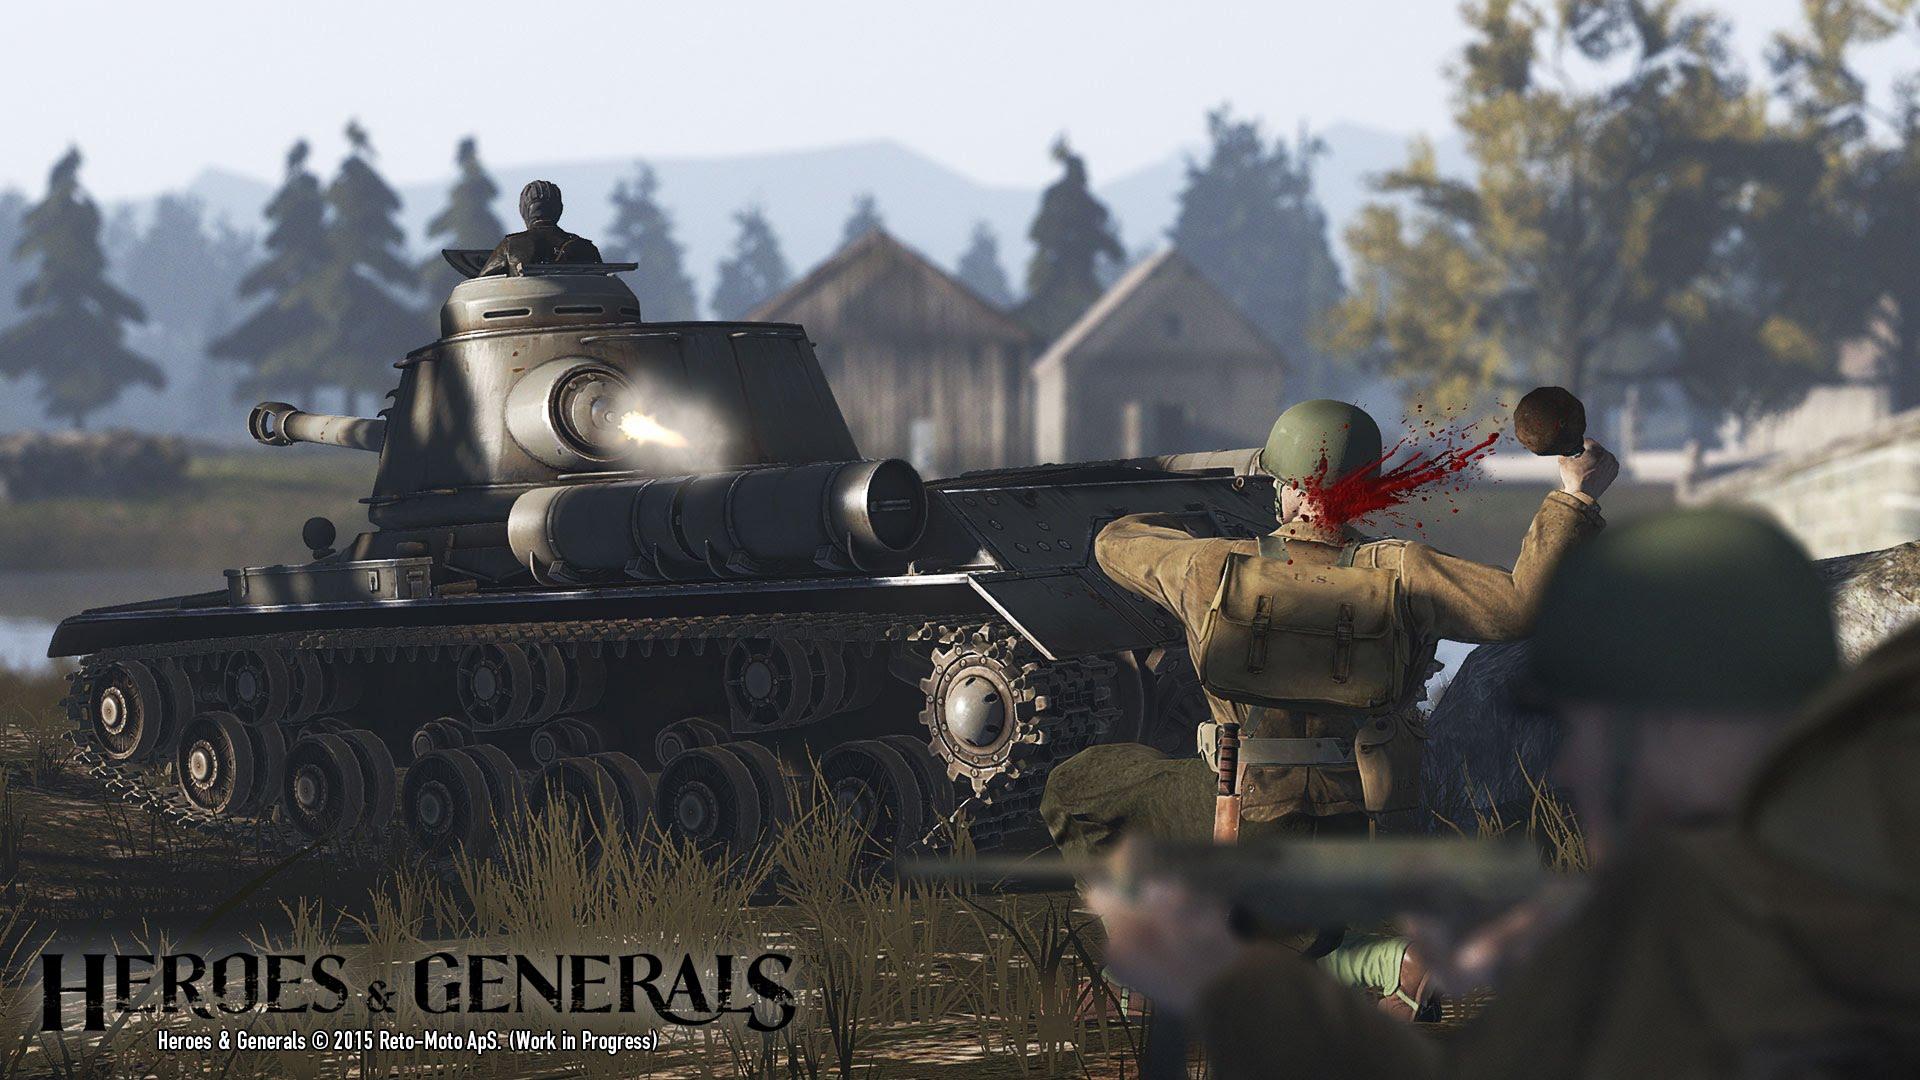 Heroes & Generals HD wallpapers, Desktop wallpaper - most viewed